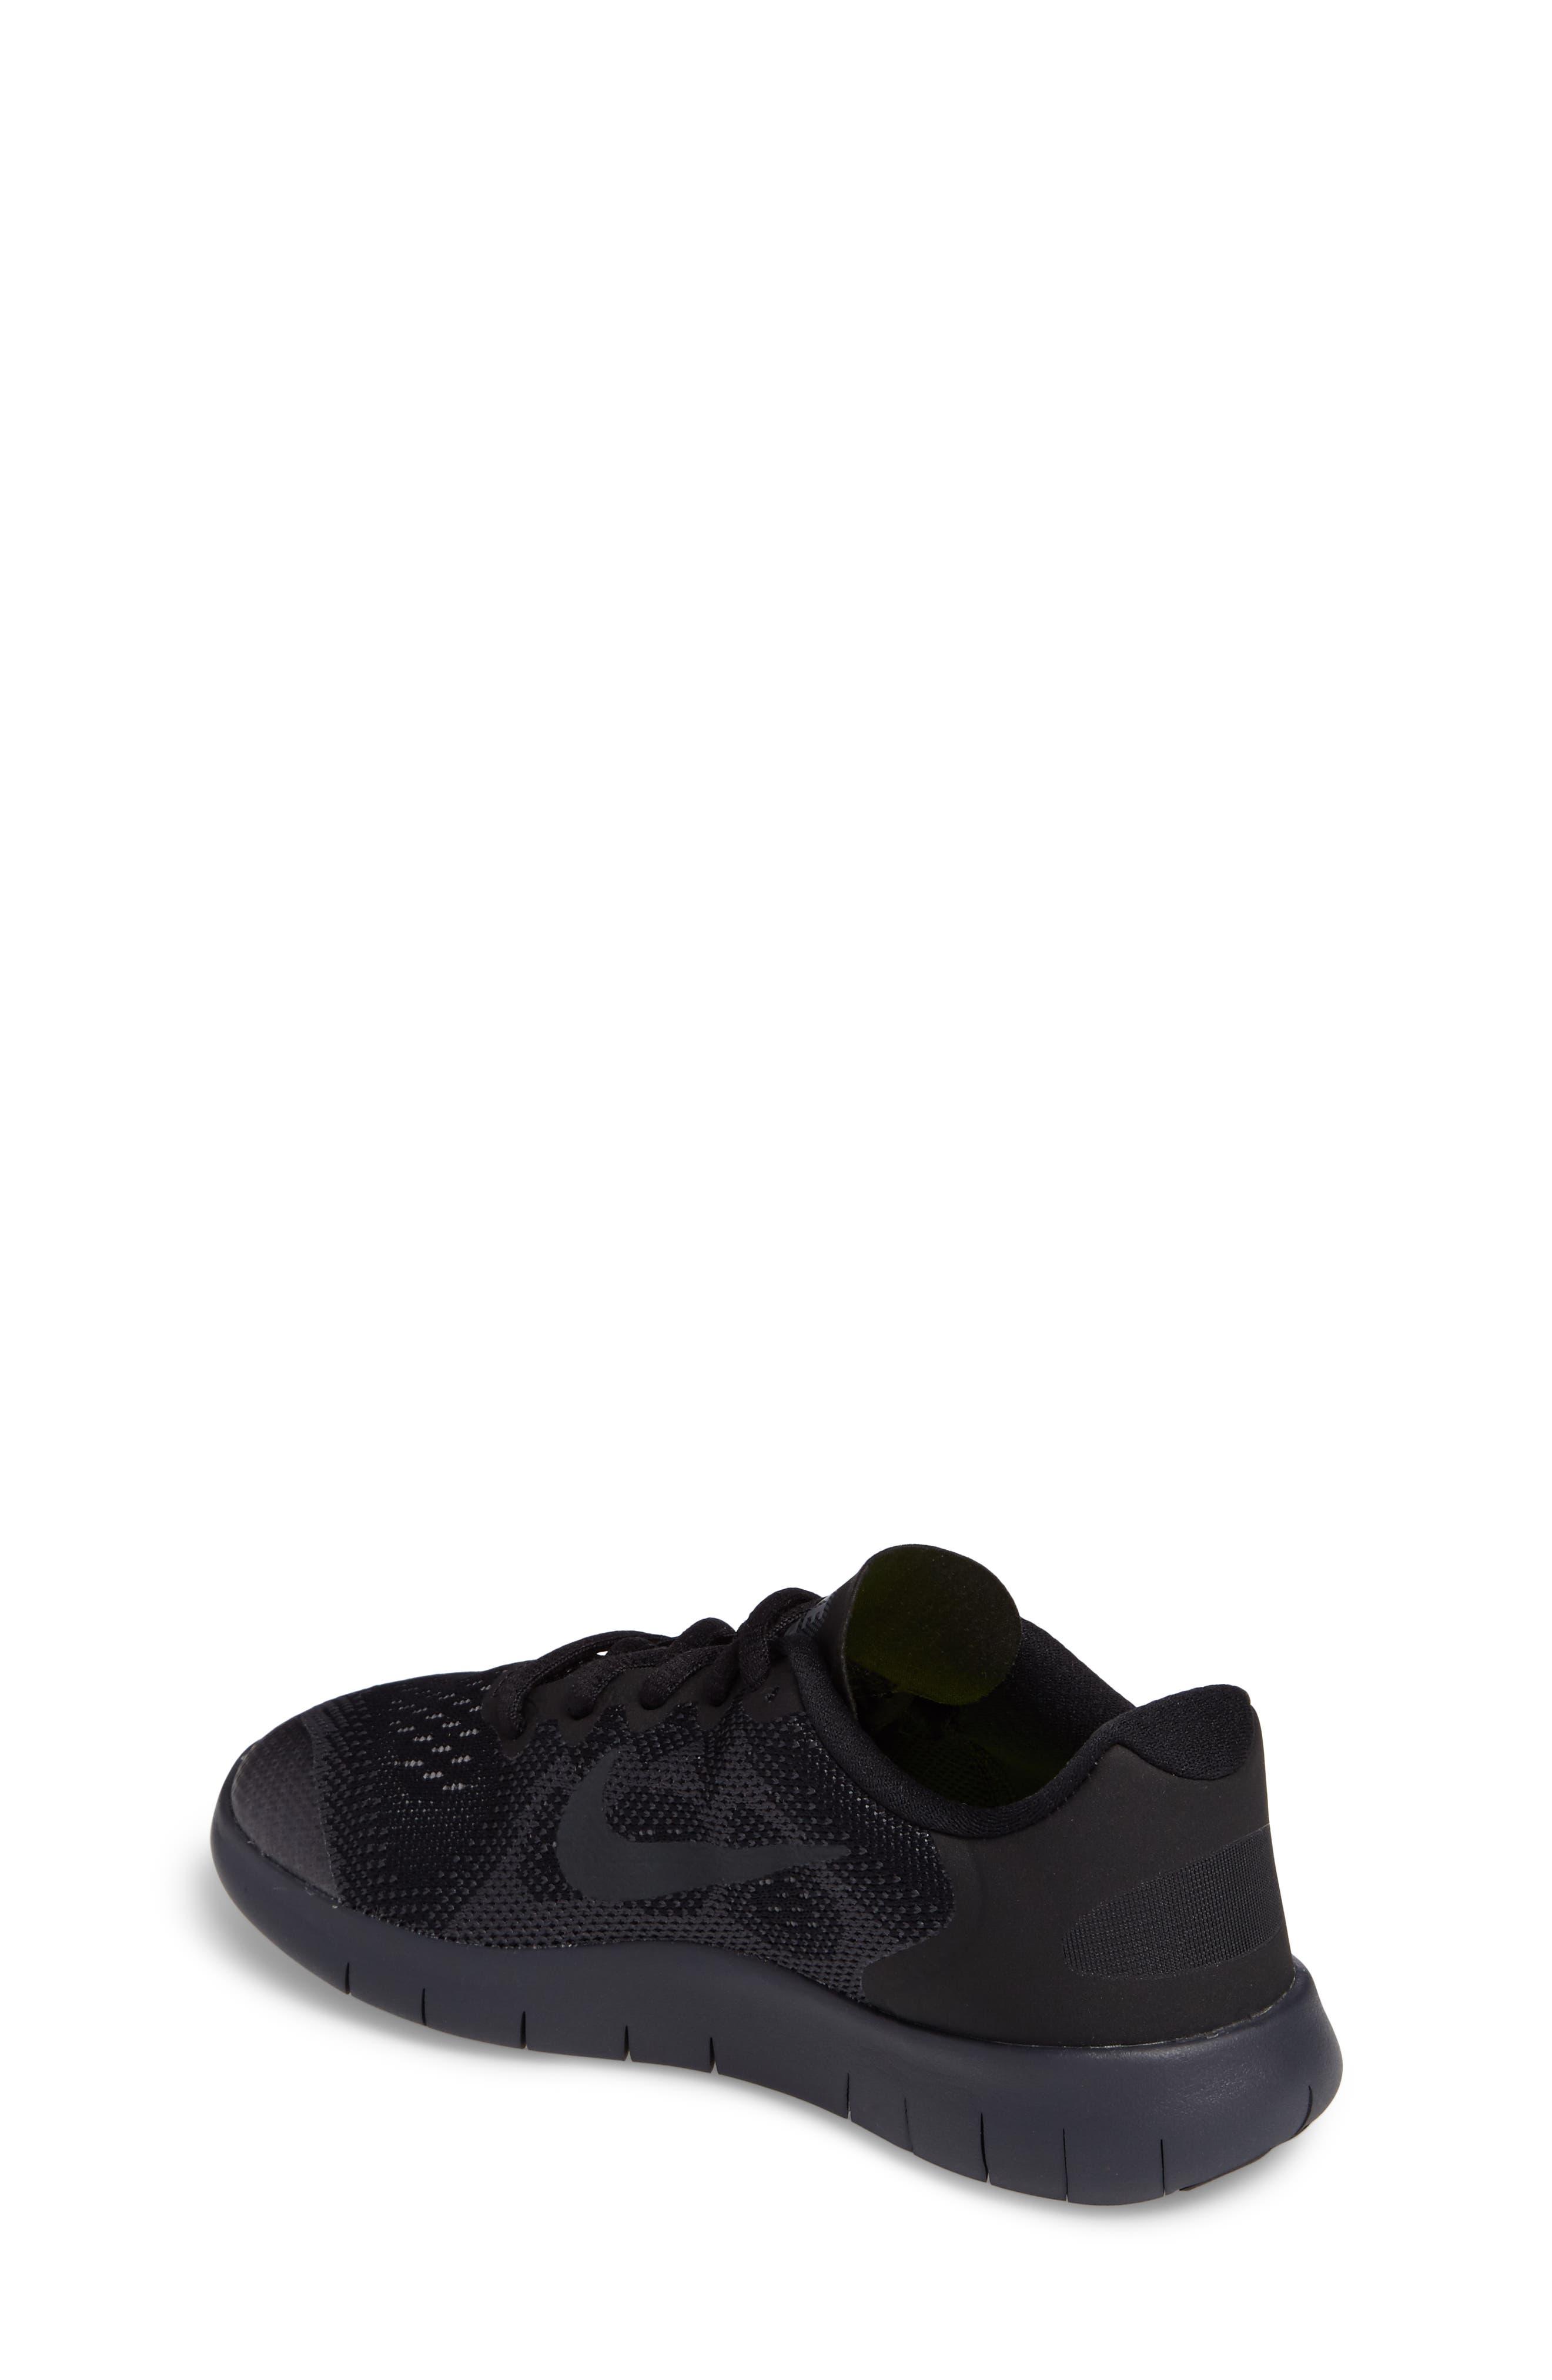 Free RN Running Shoe,                             Alternate thumbnail 2, color,                             Black/ Anthracite/ Dark Grey